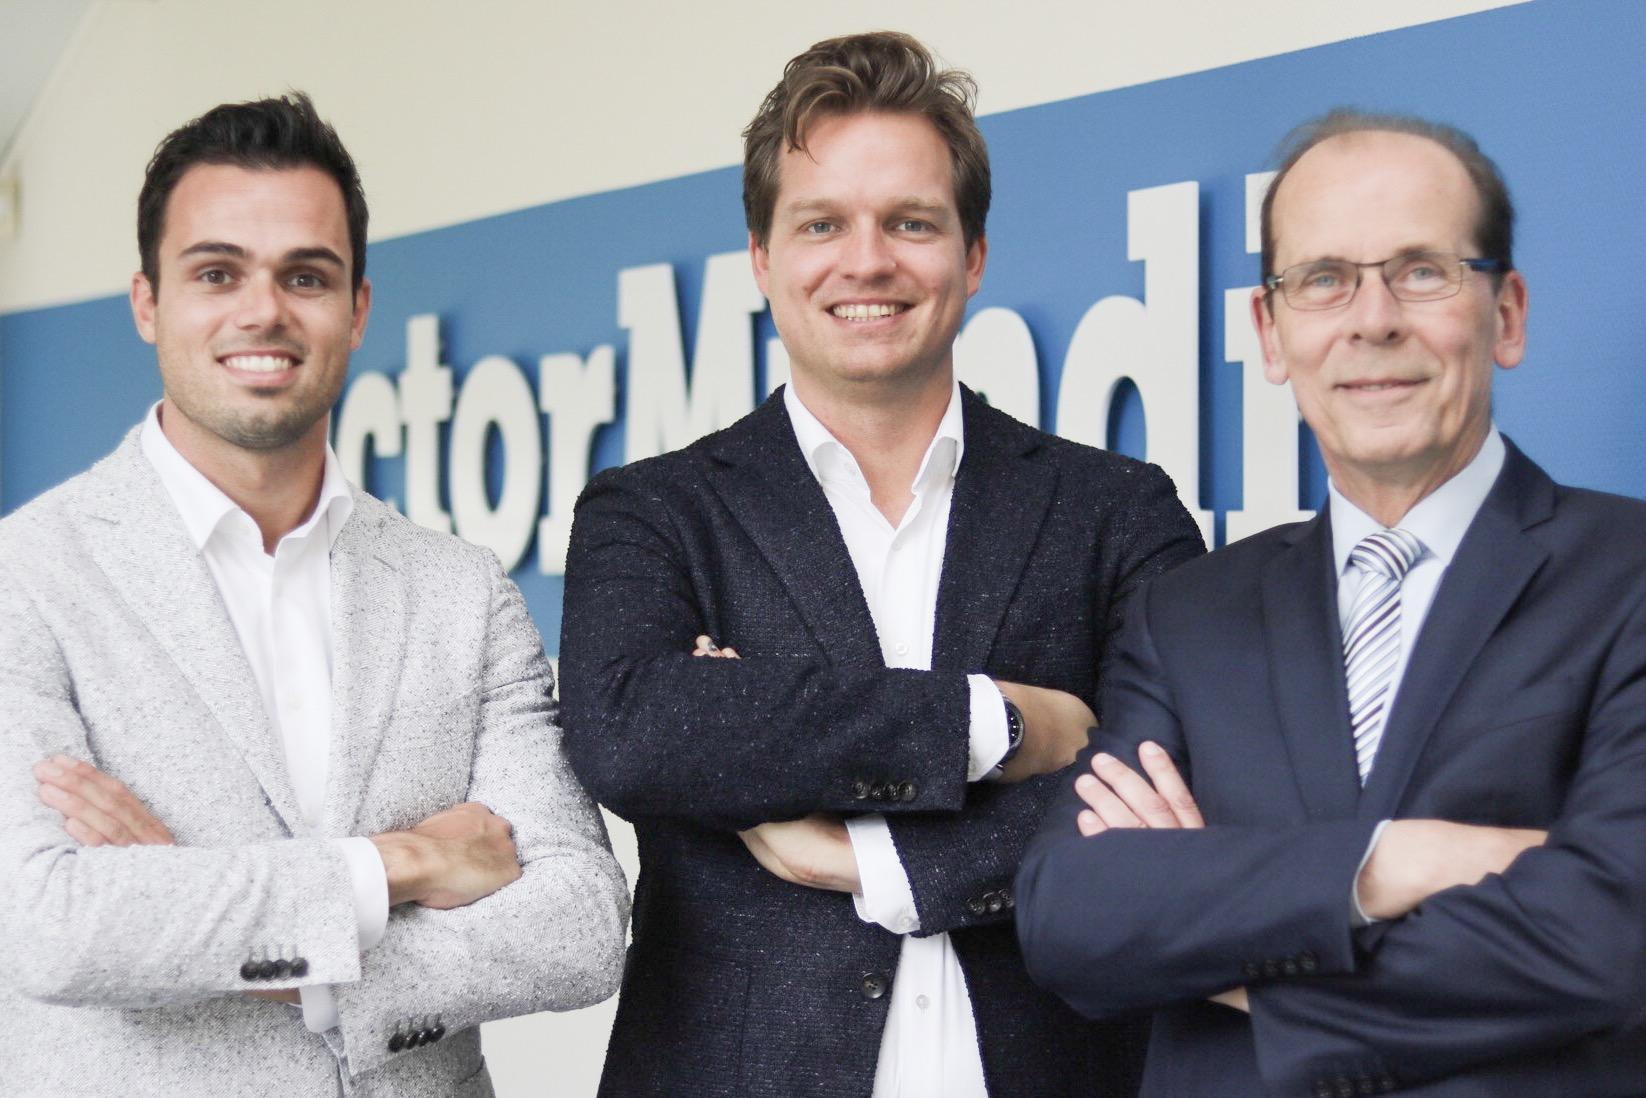 ZZP Nederland neemt Victor Mundi over, foto vlnr: Robbie Sakkers, Jeroen Sakkers en Frank Alfrink